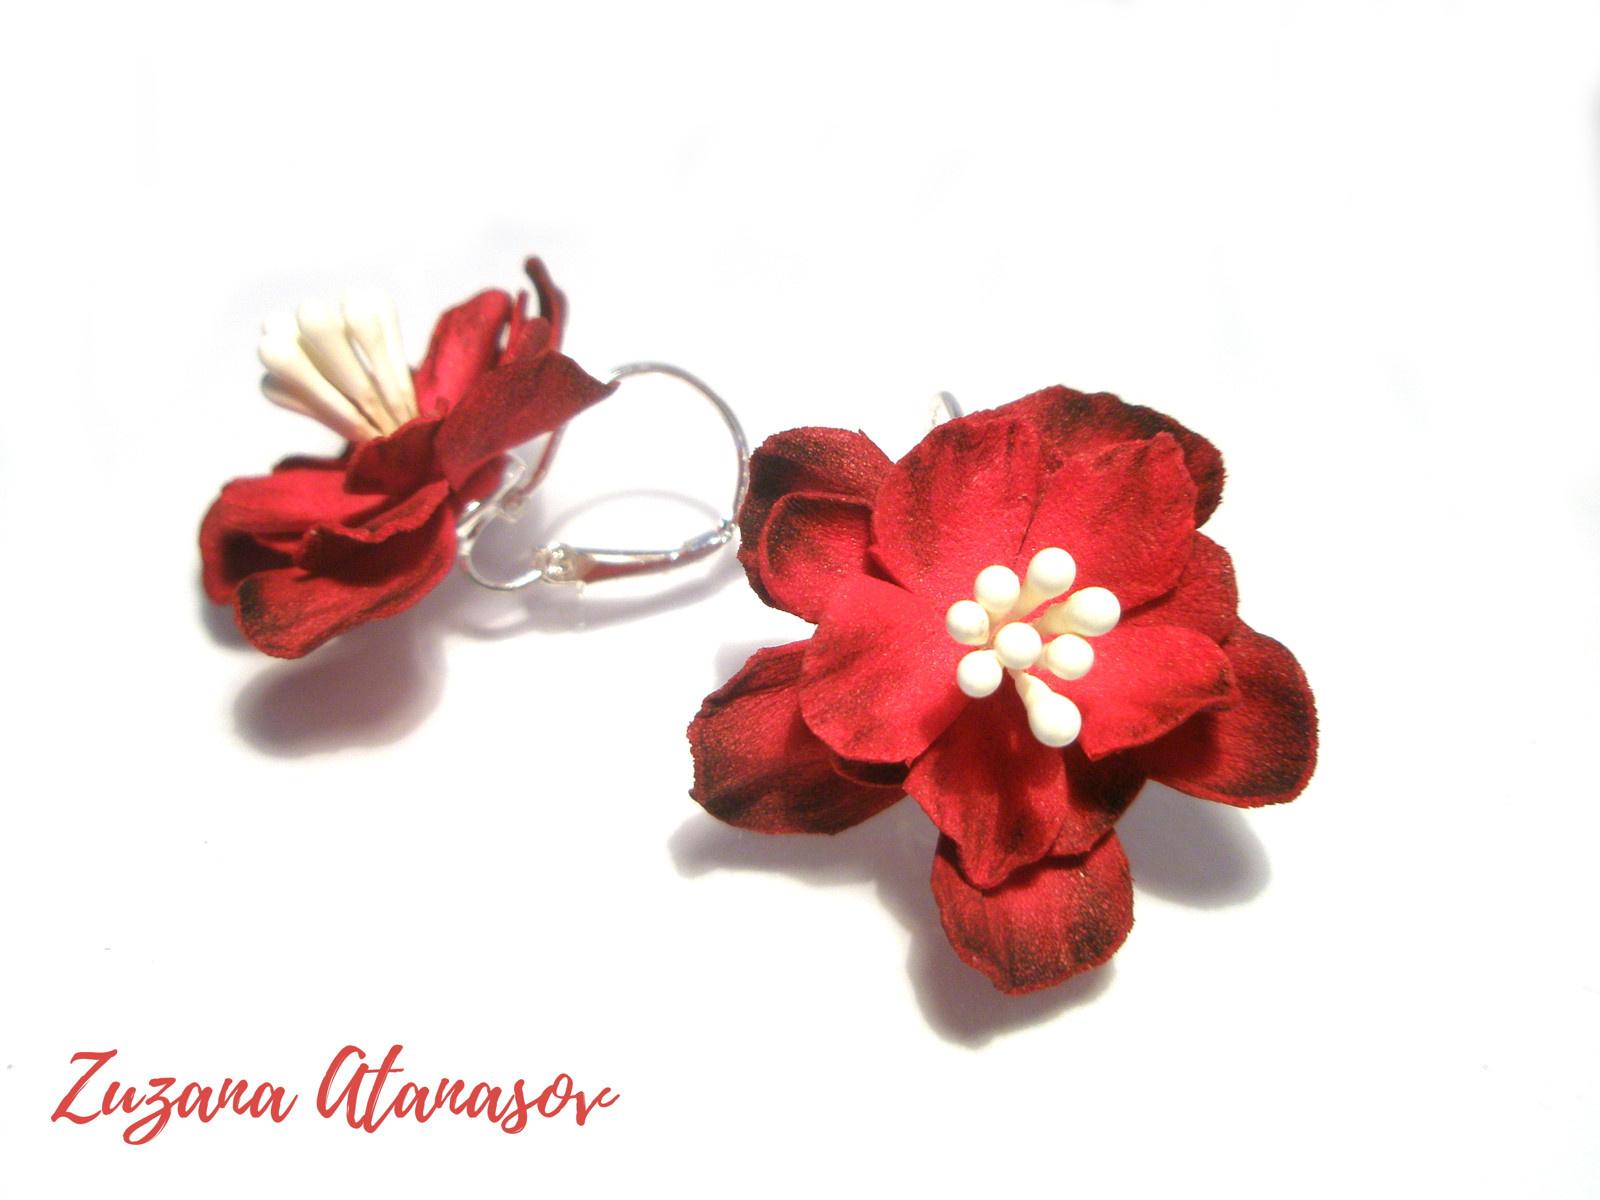 699605225d4 Rozkvetlé červené   Zboží prodejce Zuzana Atanasov